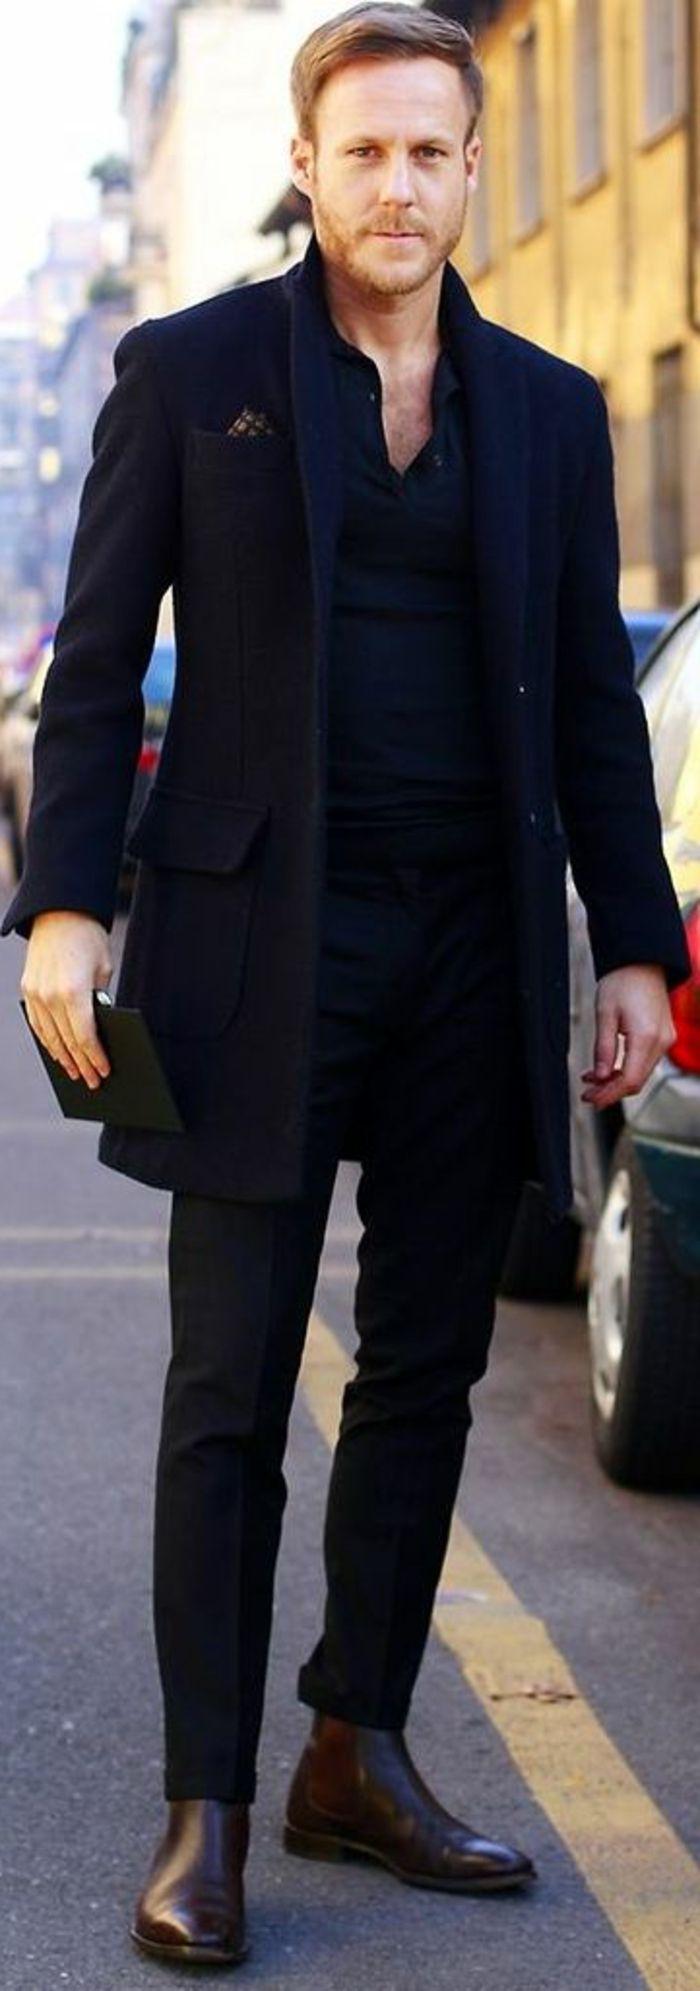 joli et elegant homme avec manteau homme zara noir